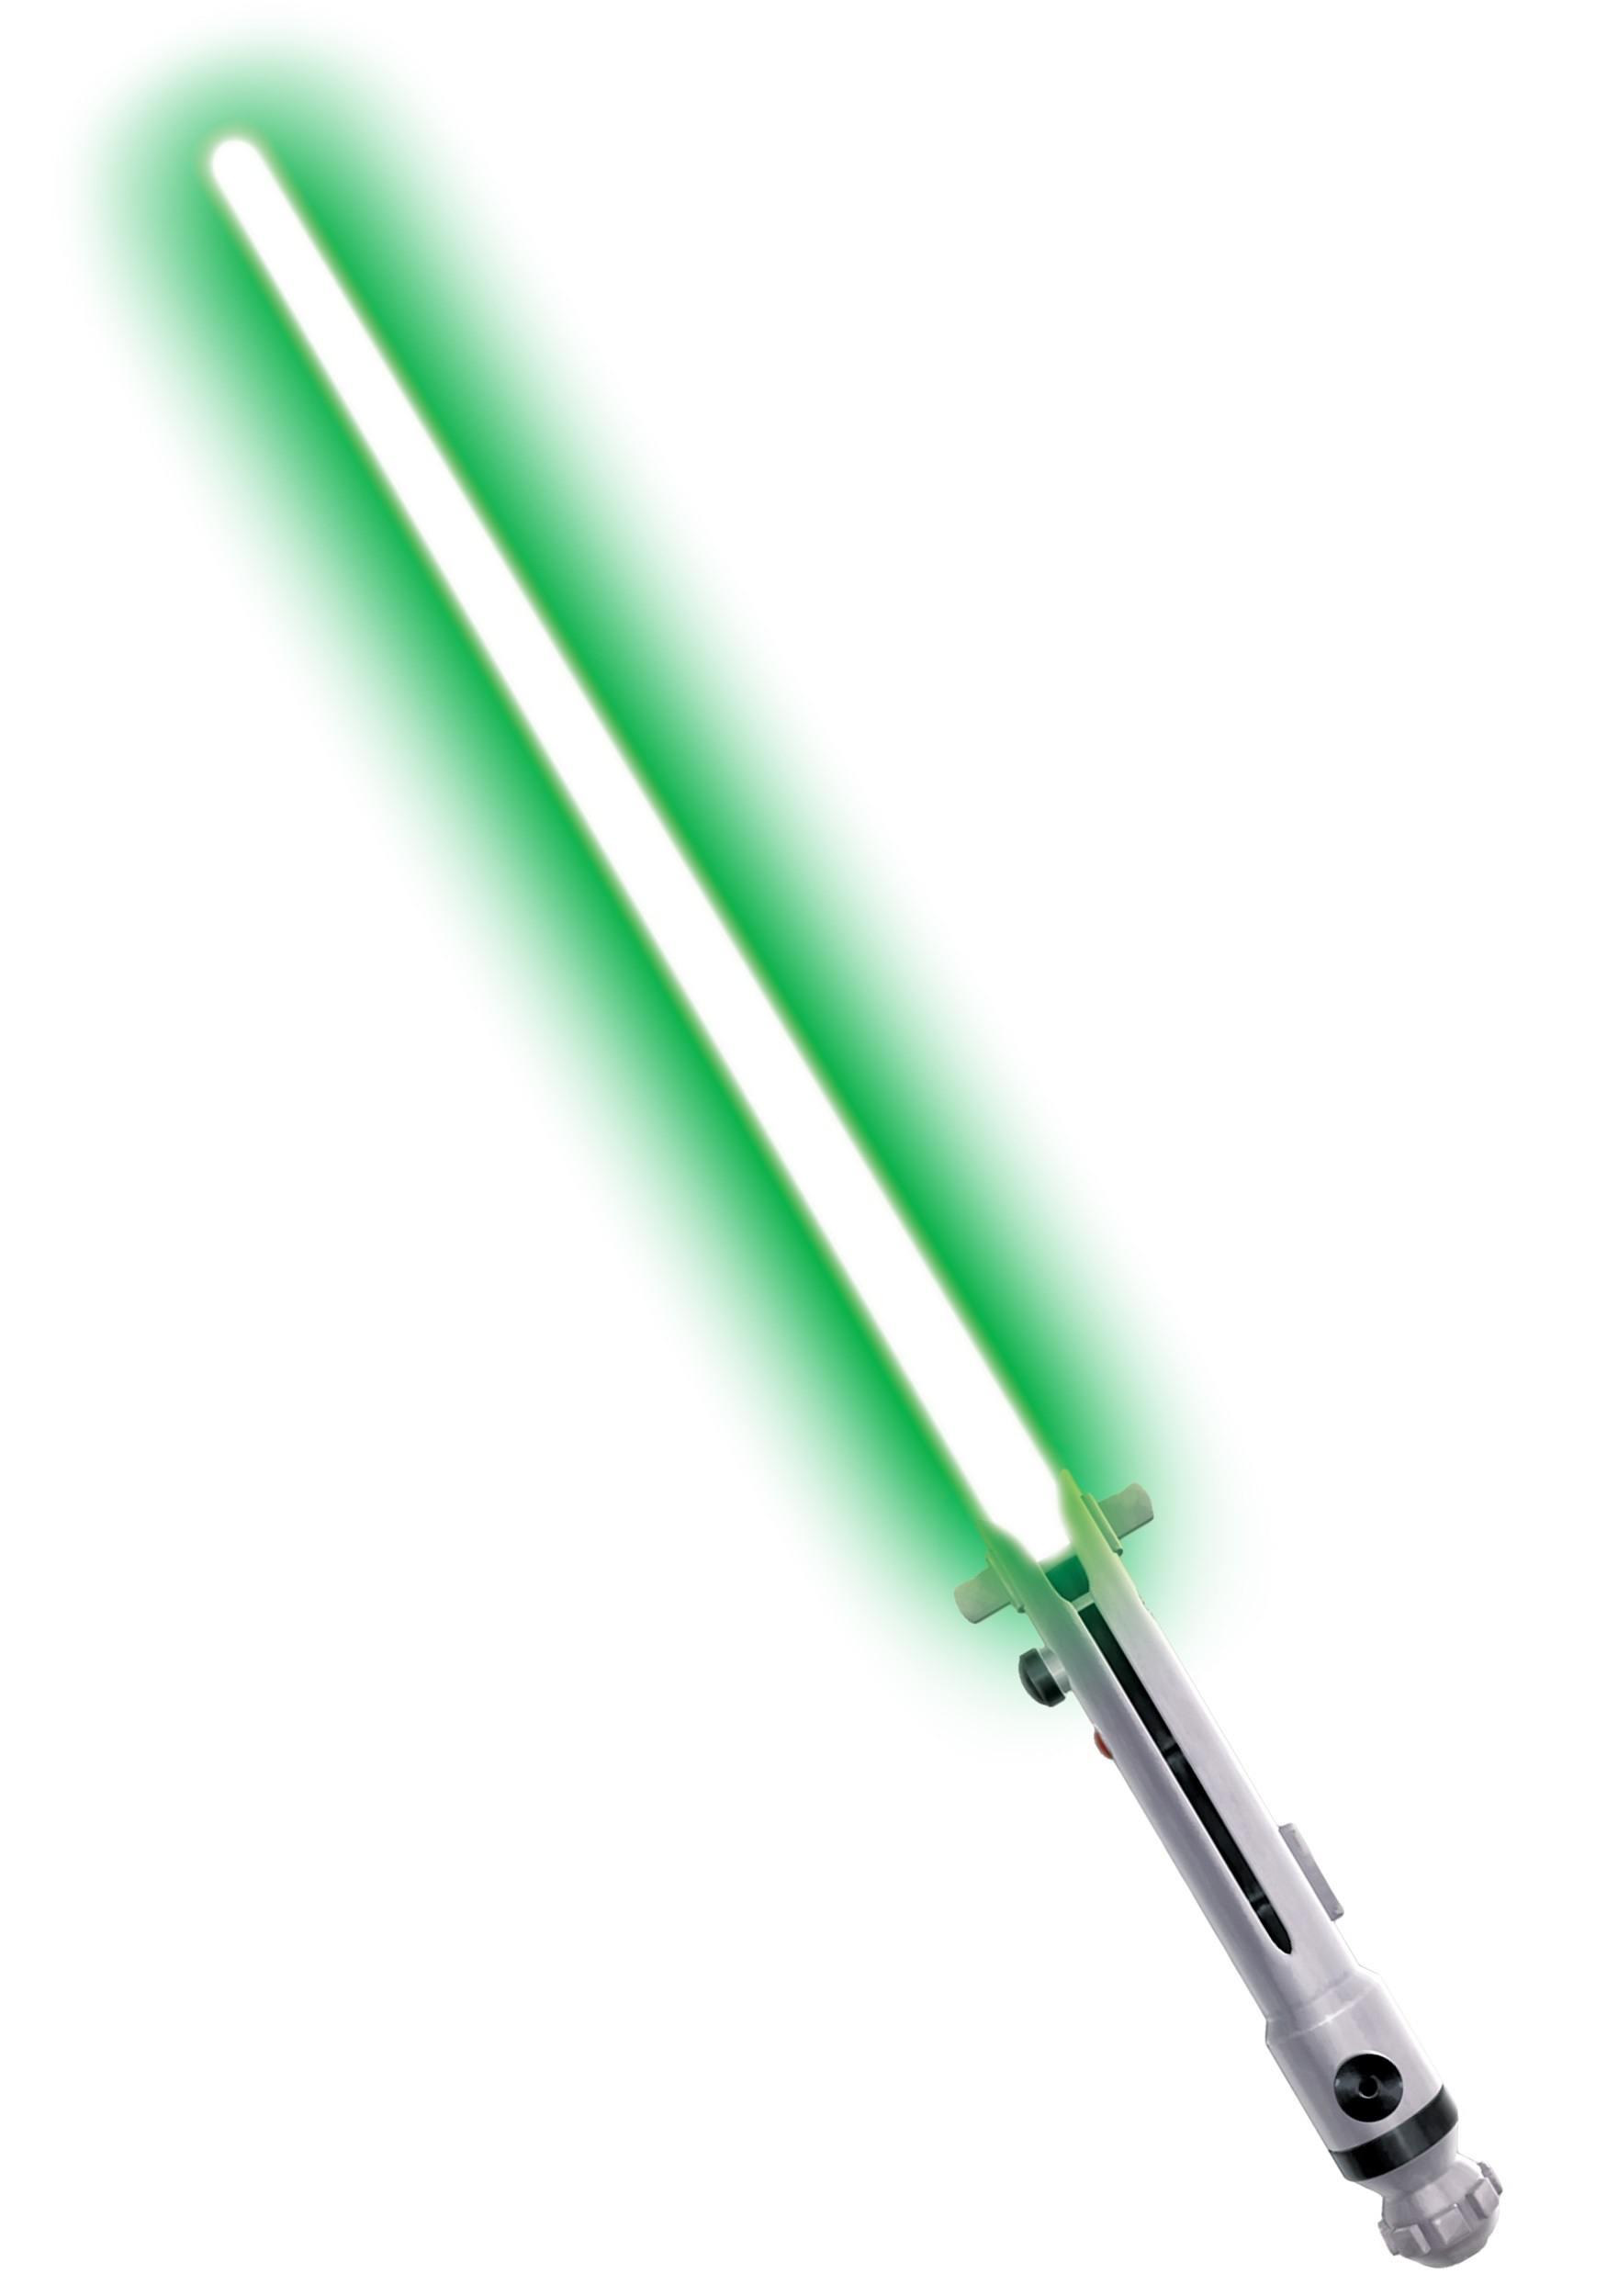 Home Star Wars Characters Ahsoka Ahsoka Tano Toy Lightsaber